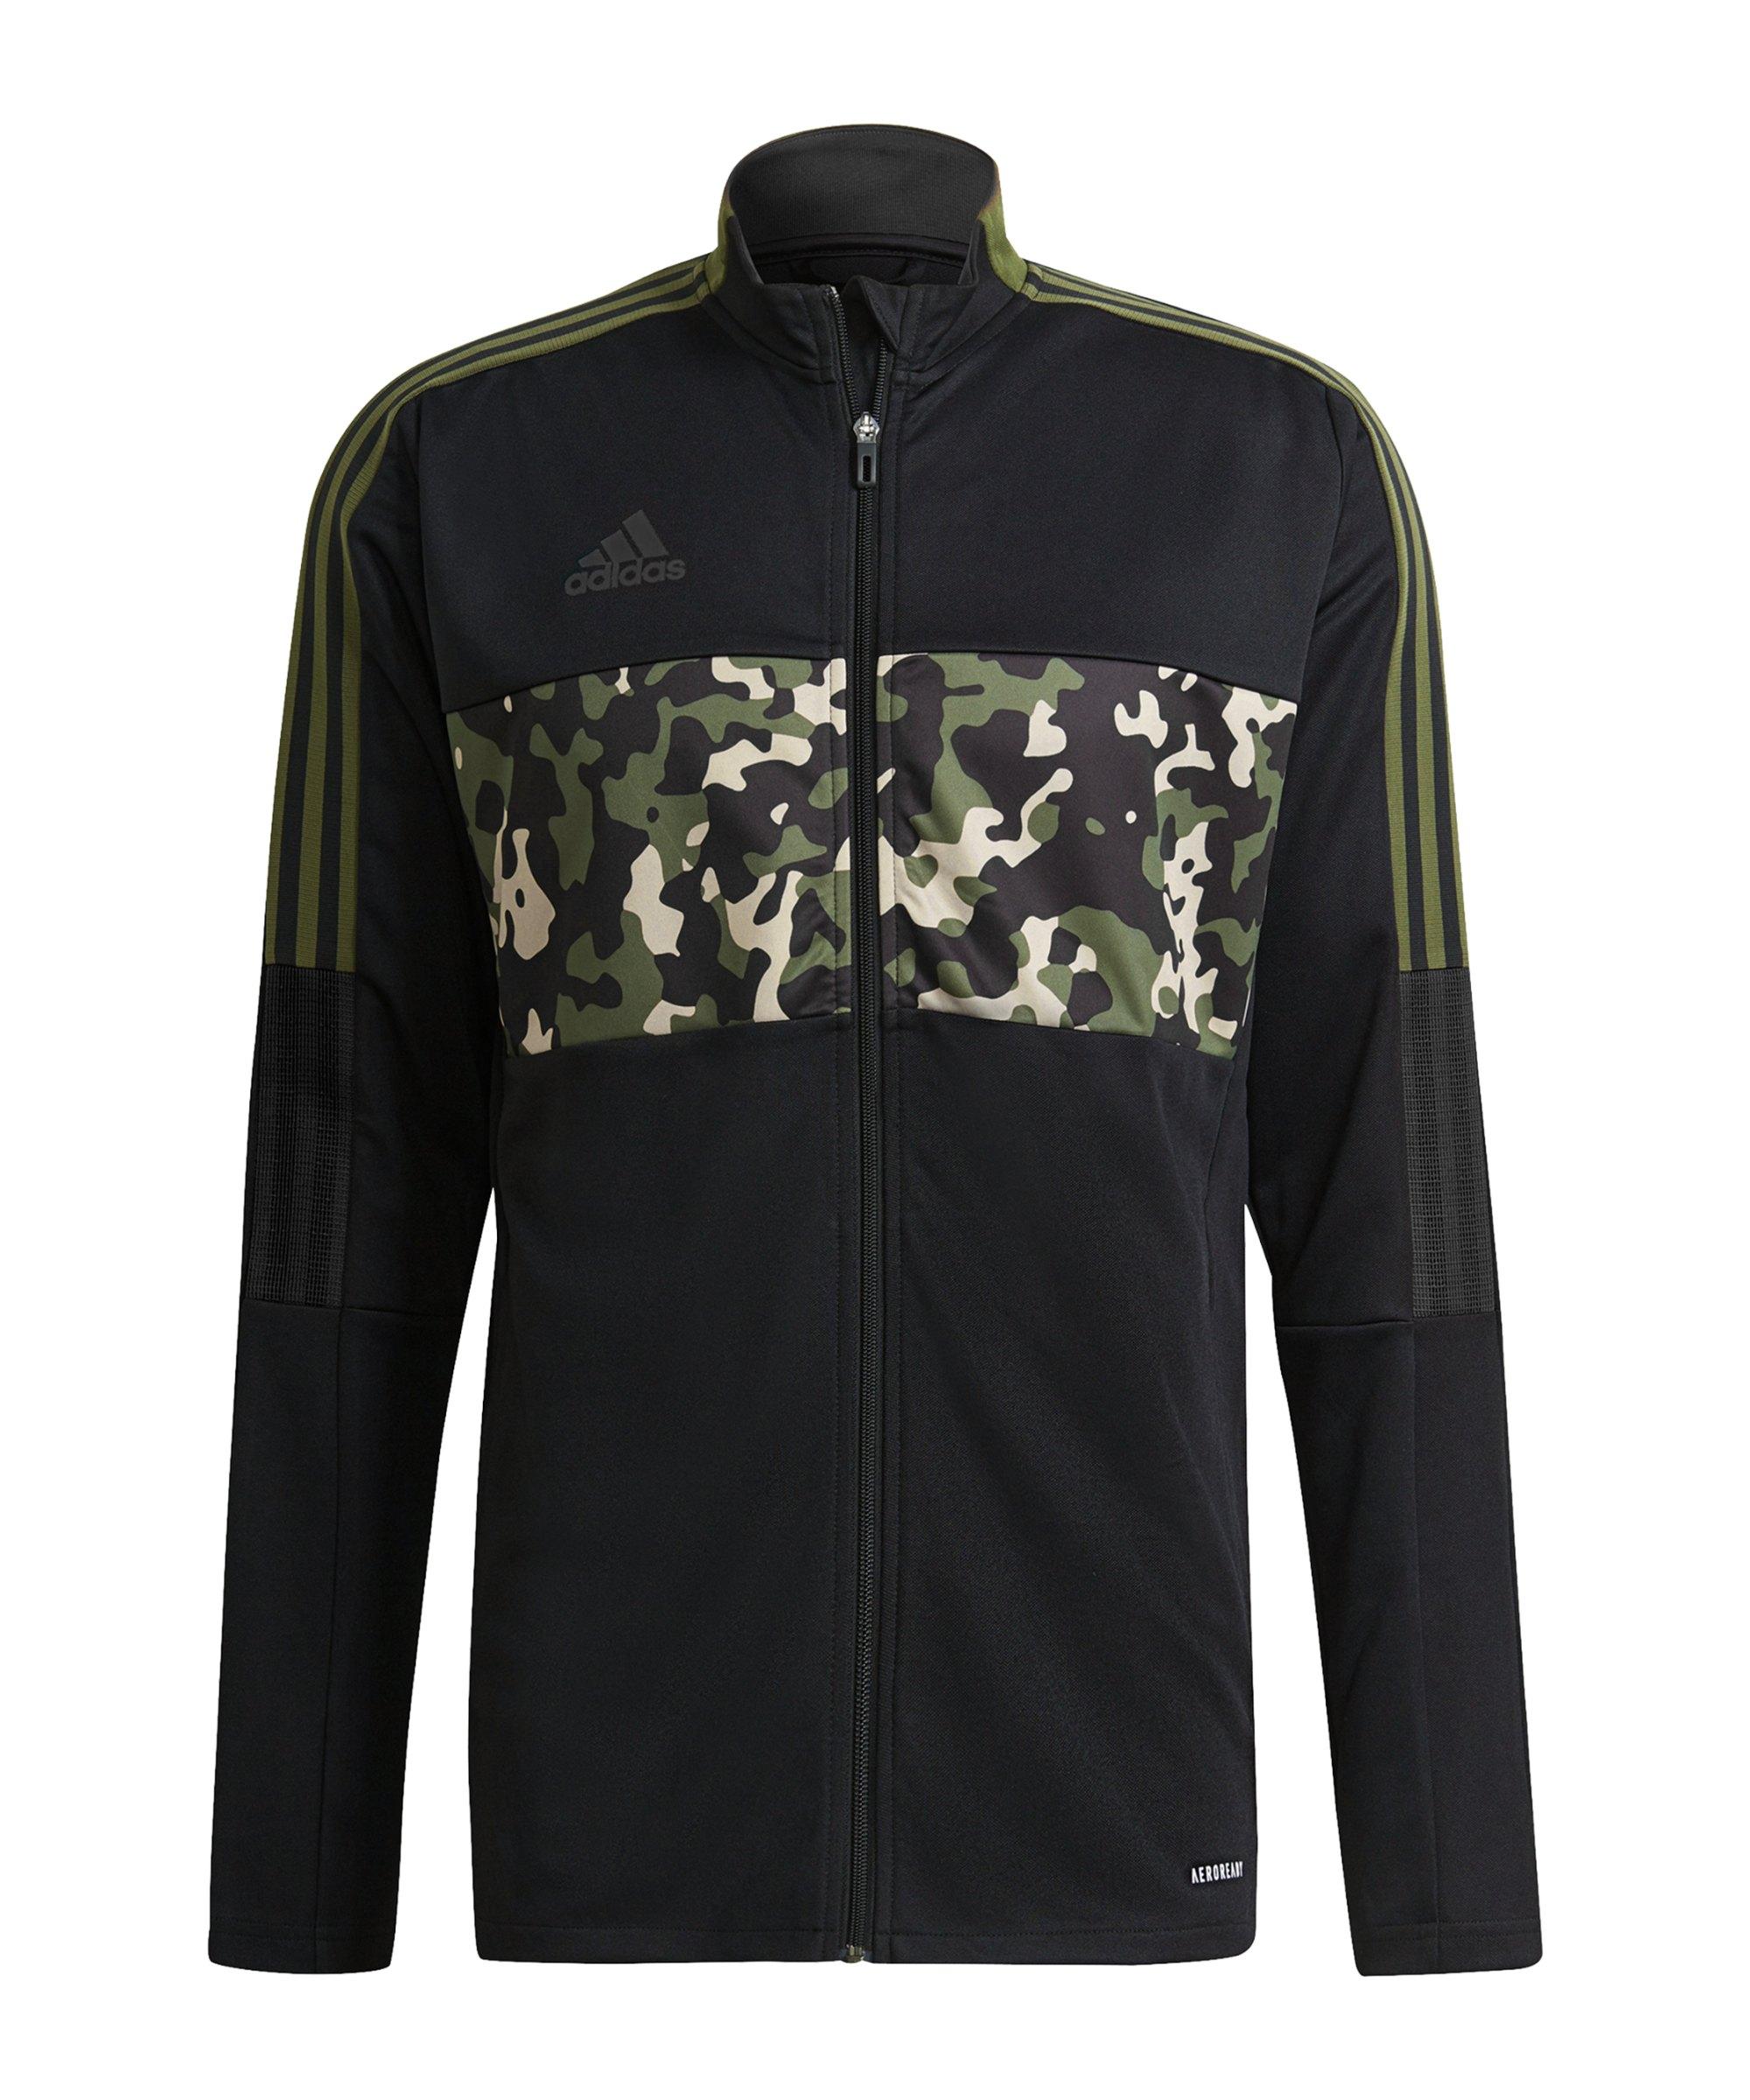 adidas Tiro AOP Trainingsjacke Schwarz - schwarz